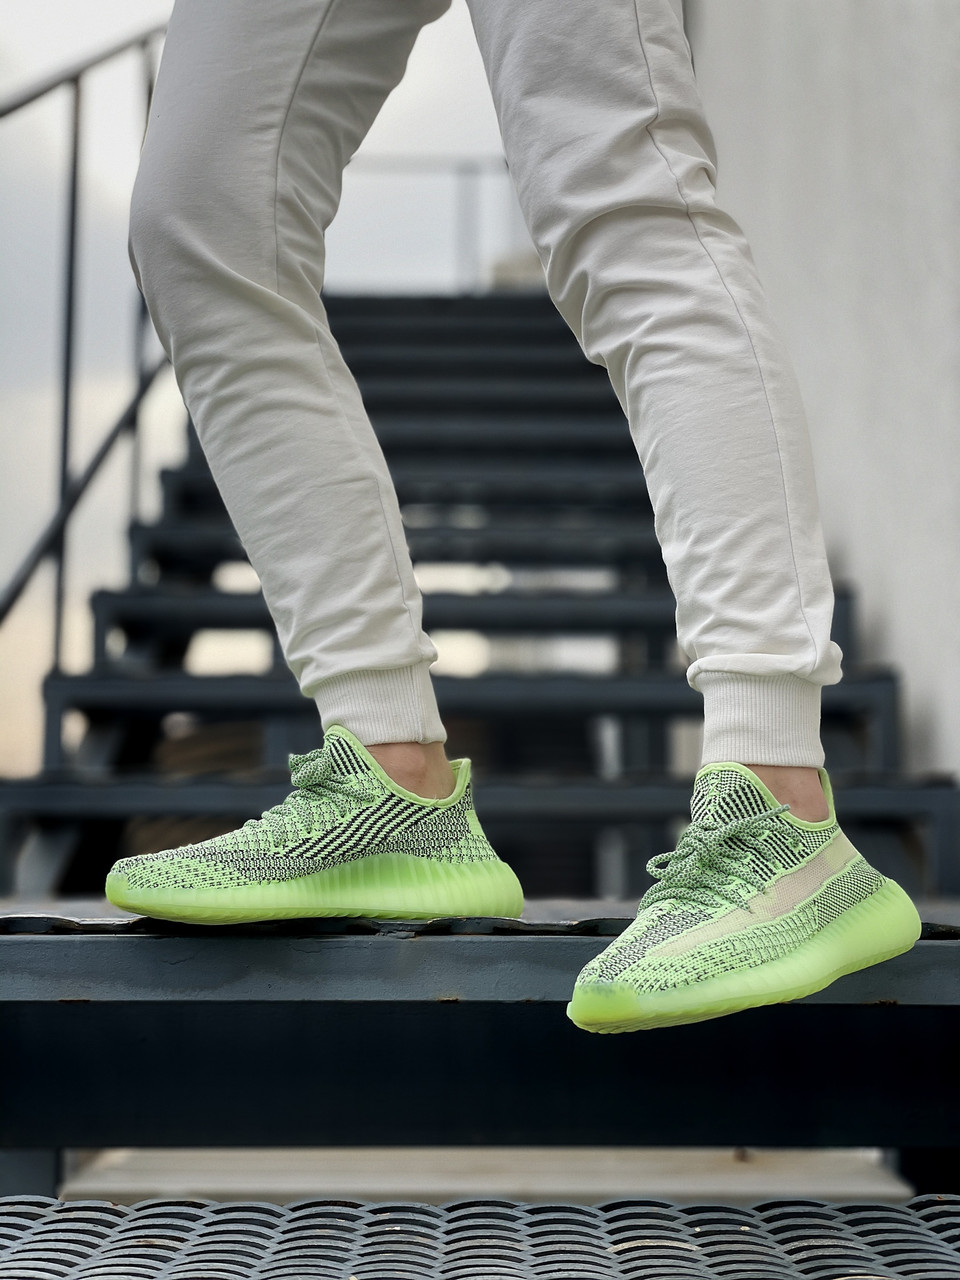 Жіночі кросівки Adidas Yeezy Boost 350 V2 салатові